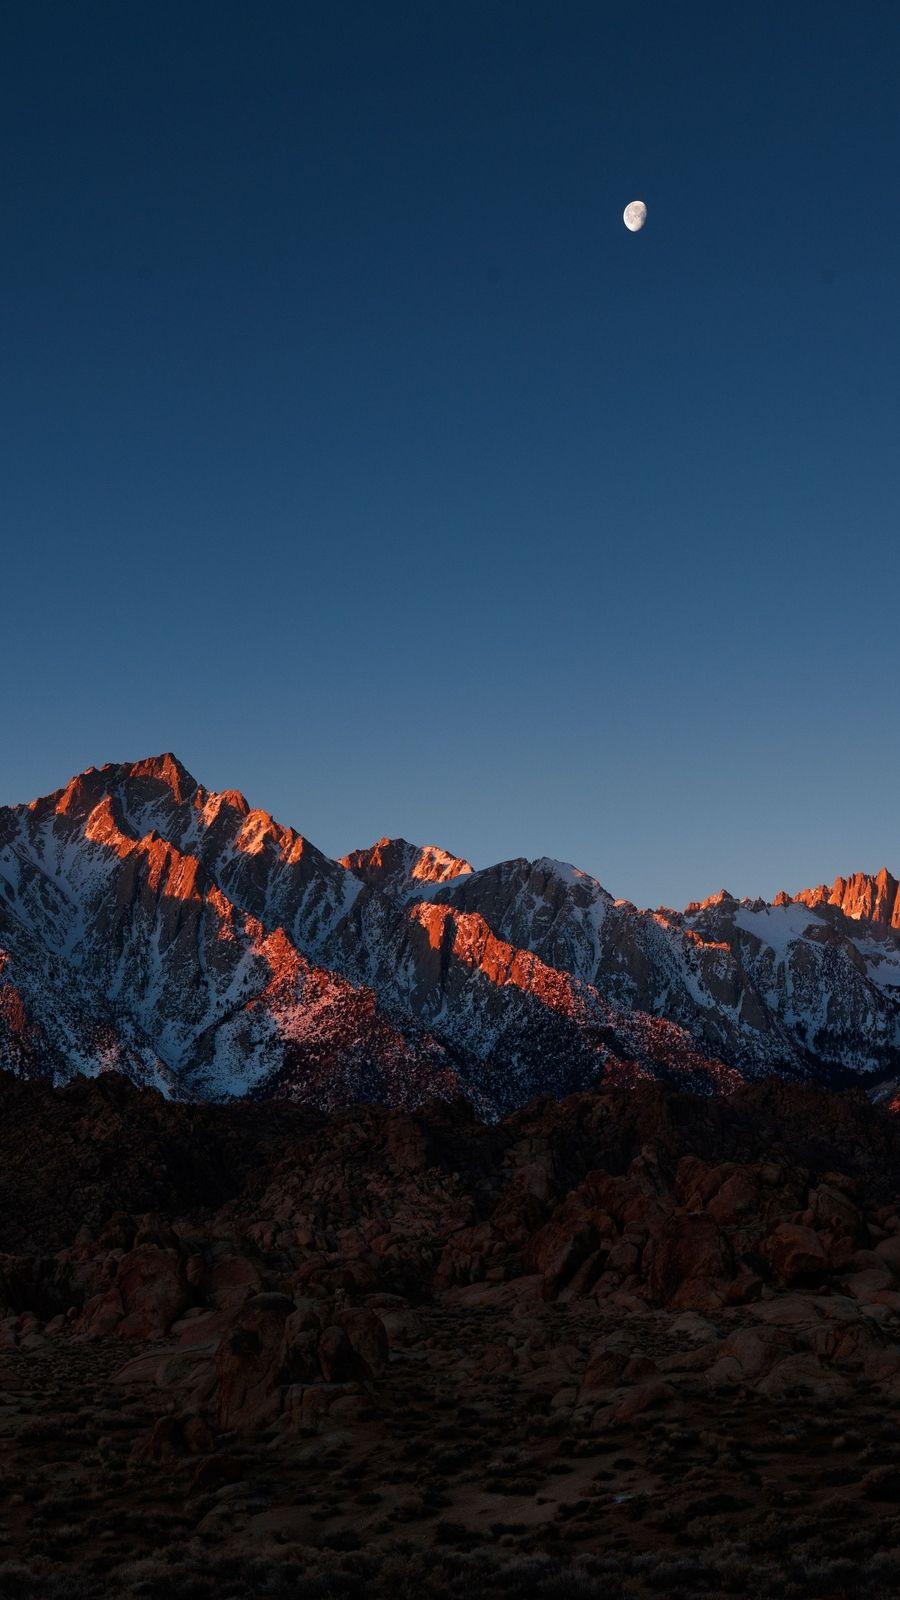 Mount Whitney Alabama Hills Iphone Wallpaper - Mountain Wallpaper Iphone 7 , HD Wallpaper & Backgrounds